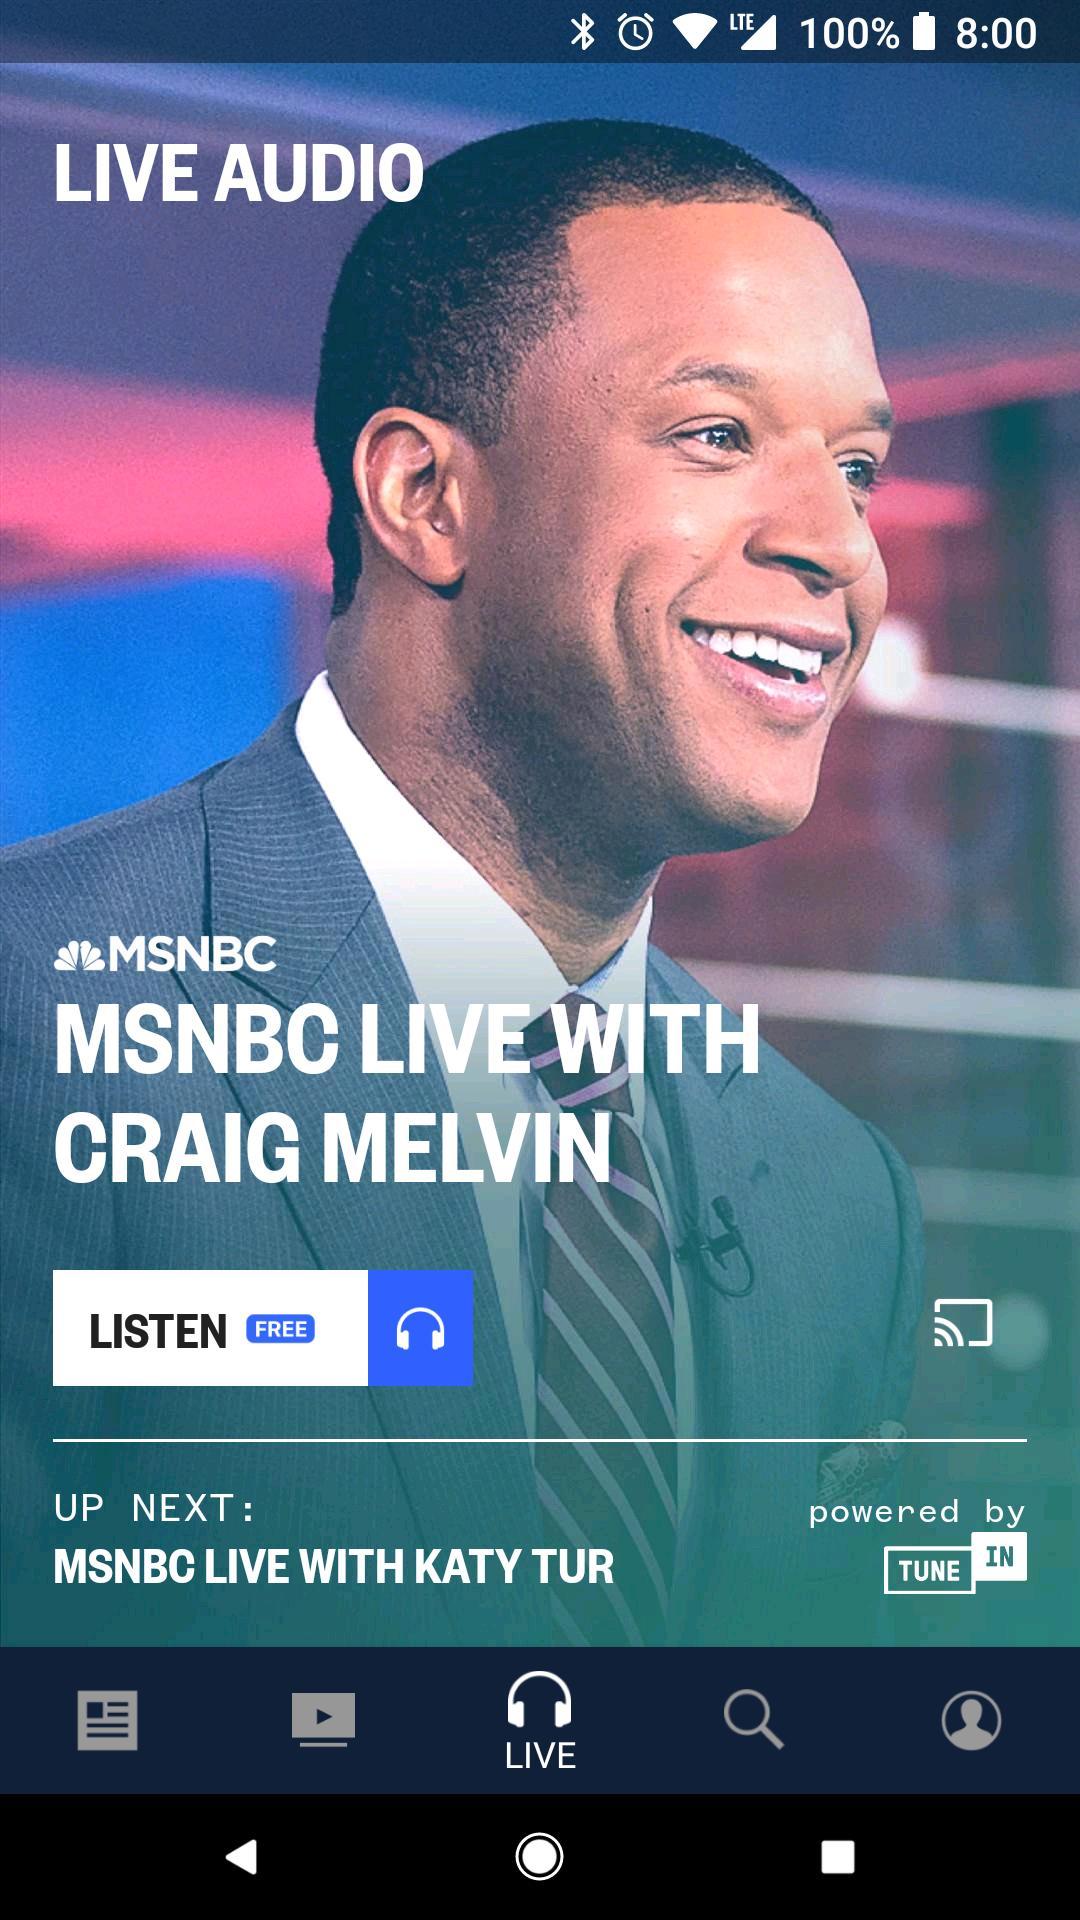 NBC News: Breaking News, US News & Live Video 6.0.11 Screenshot 3